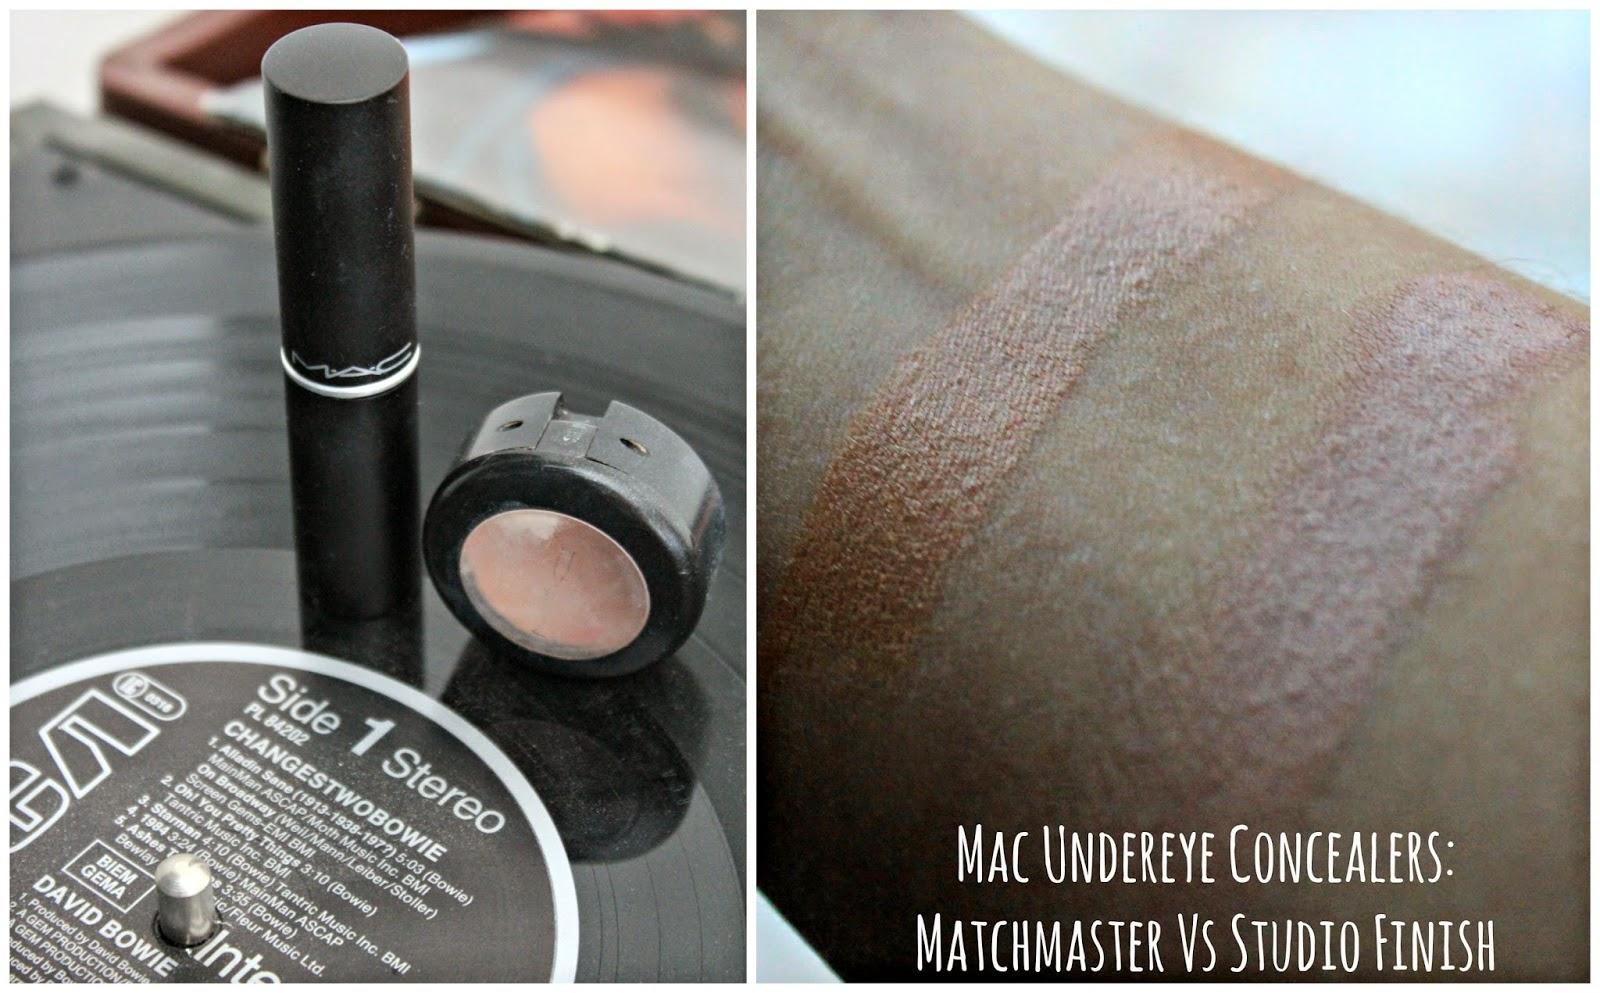 Mac Undereye Concealers: Matchmaster Vs Studio Finish